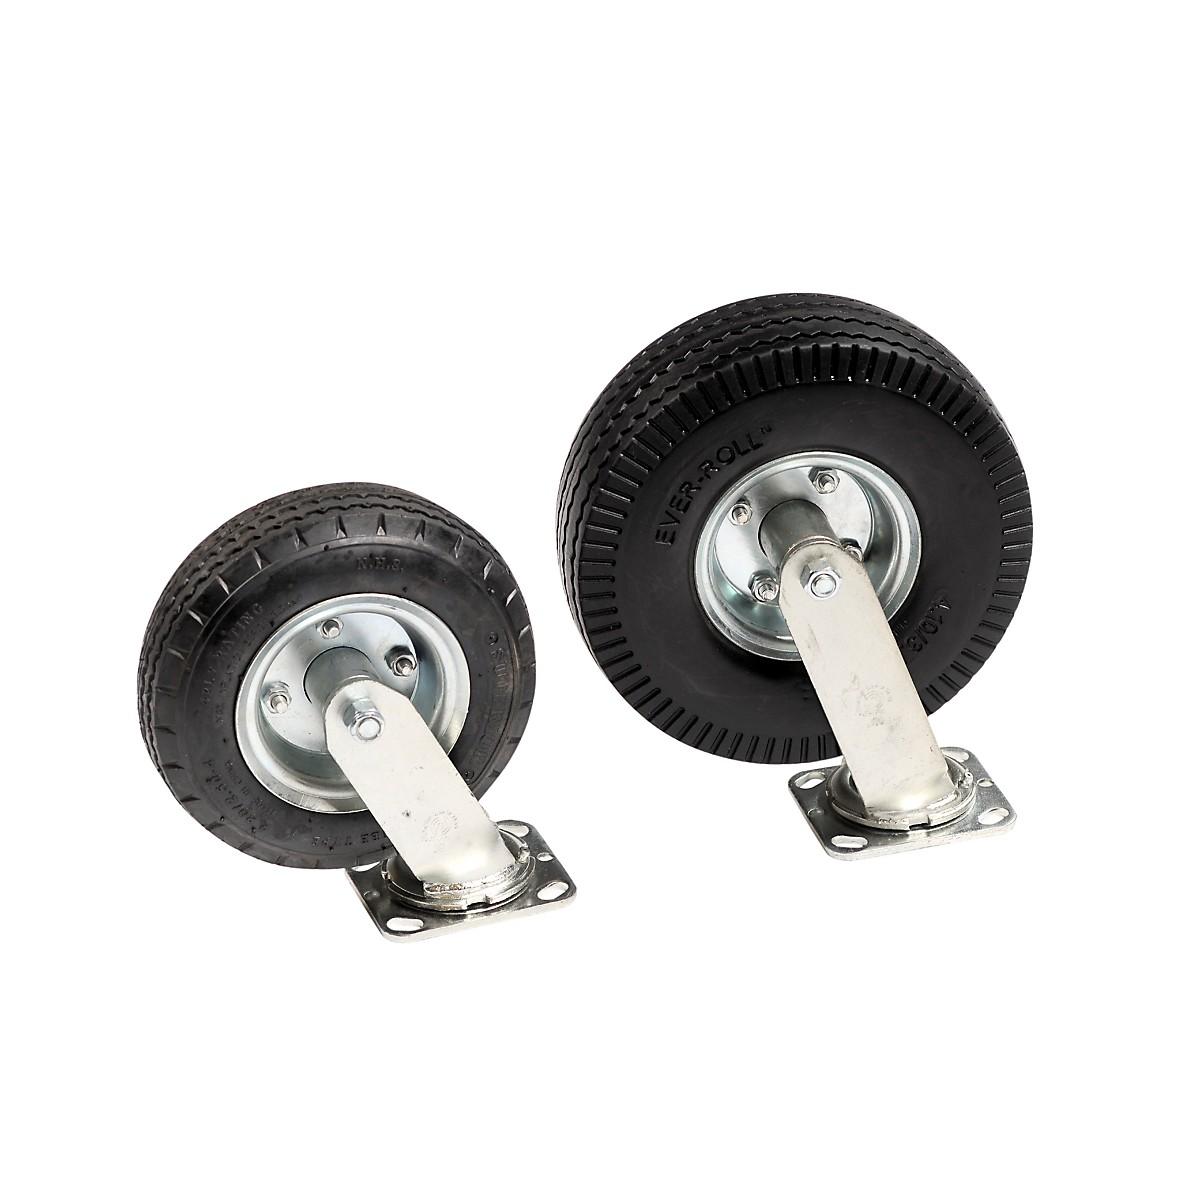 Titan Field Frames 8 Inch Pneumatic Standard Air Tire Replacements